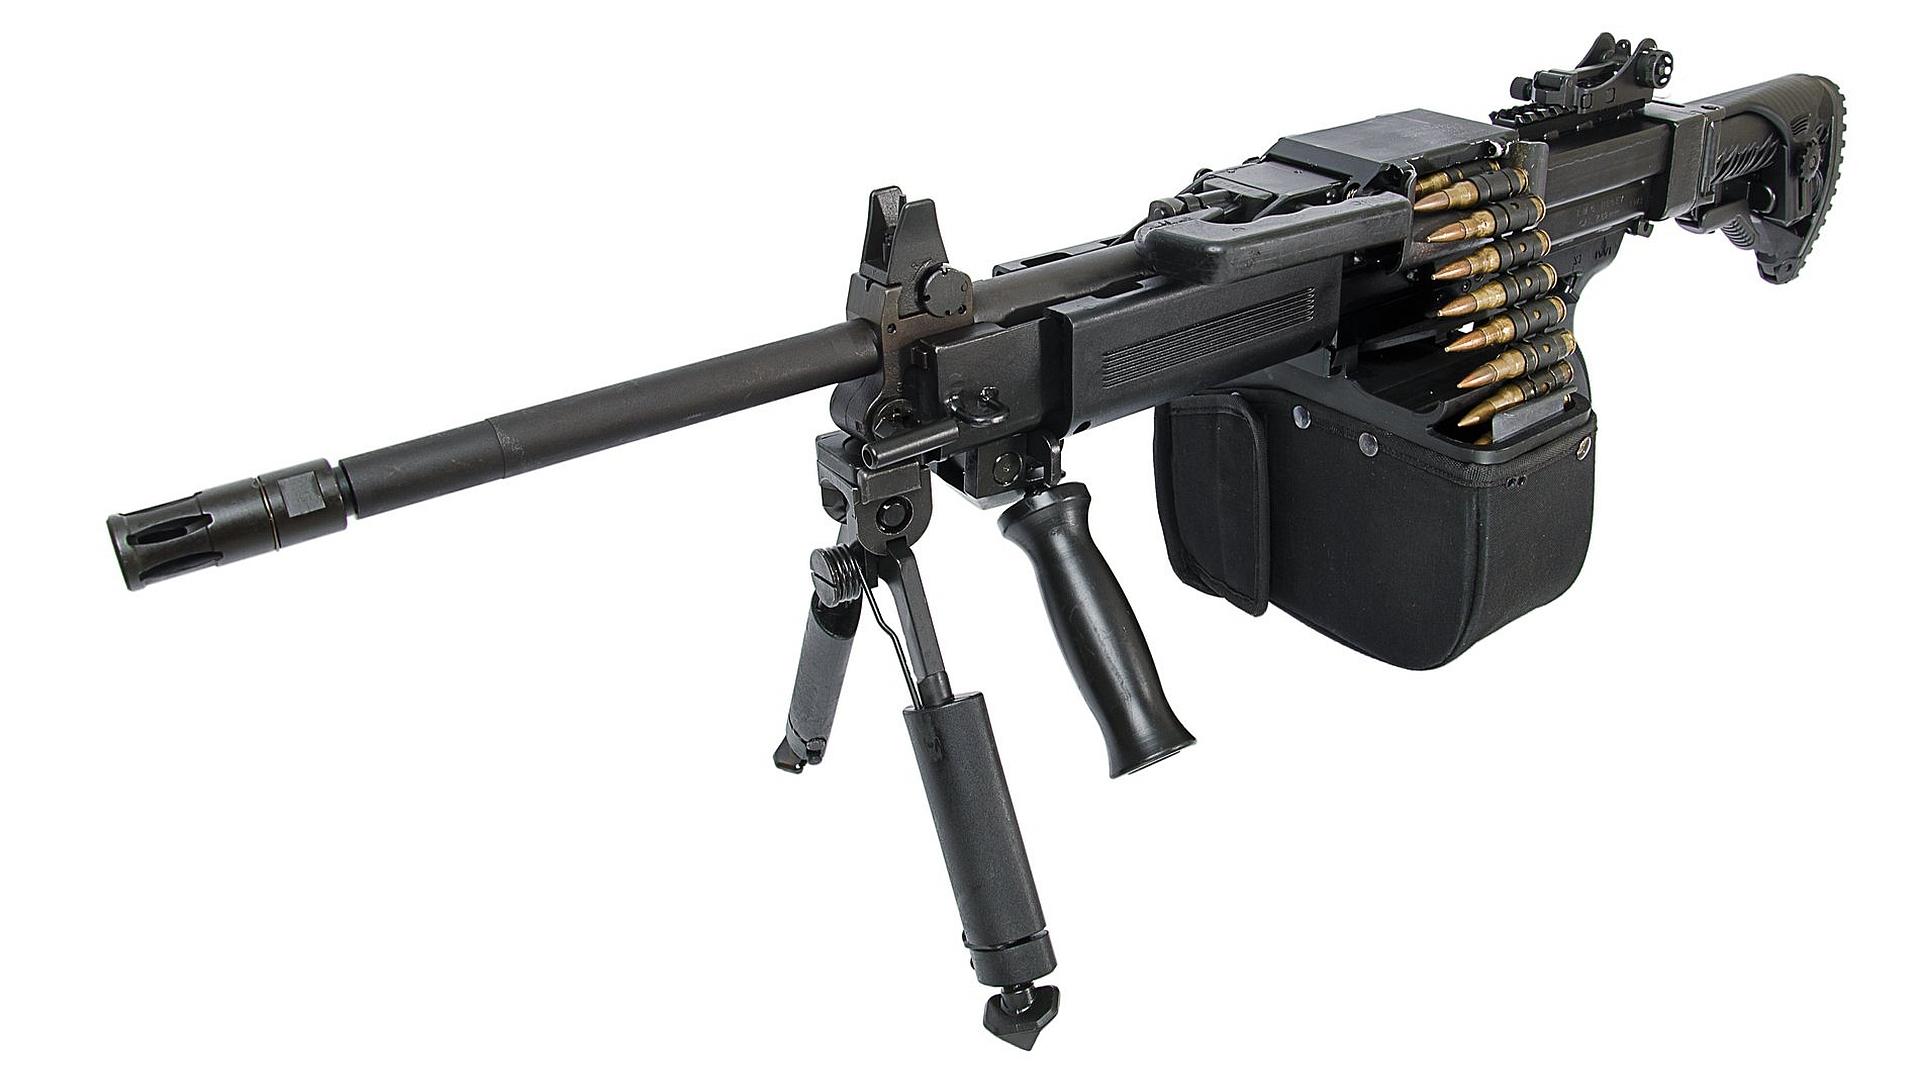 Negev Ng7 Machine Gun Full HD Wallpaper And Background Image